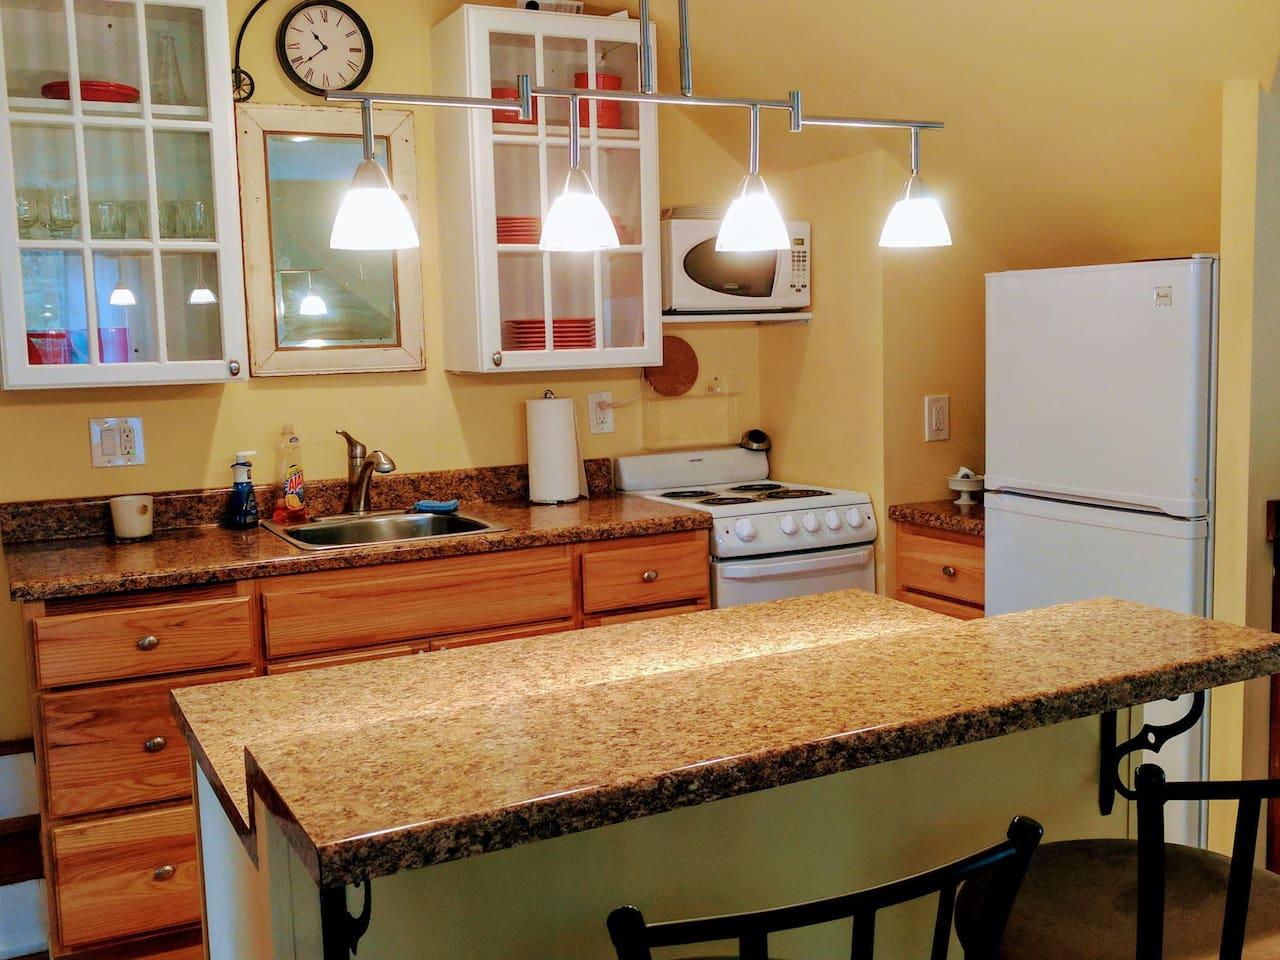 Kitchen, breakfast bar, refrigerator and stove